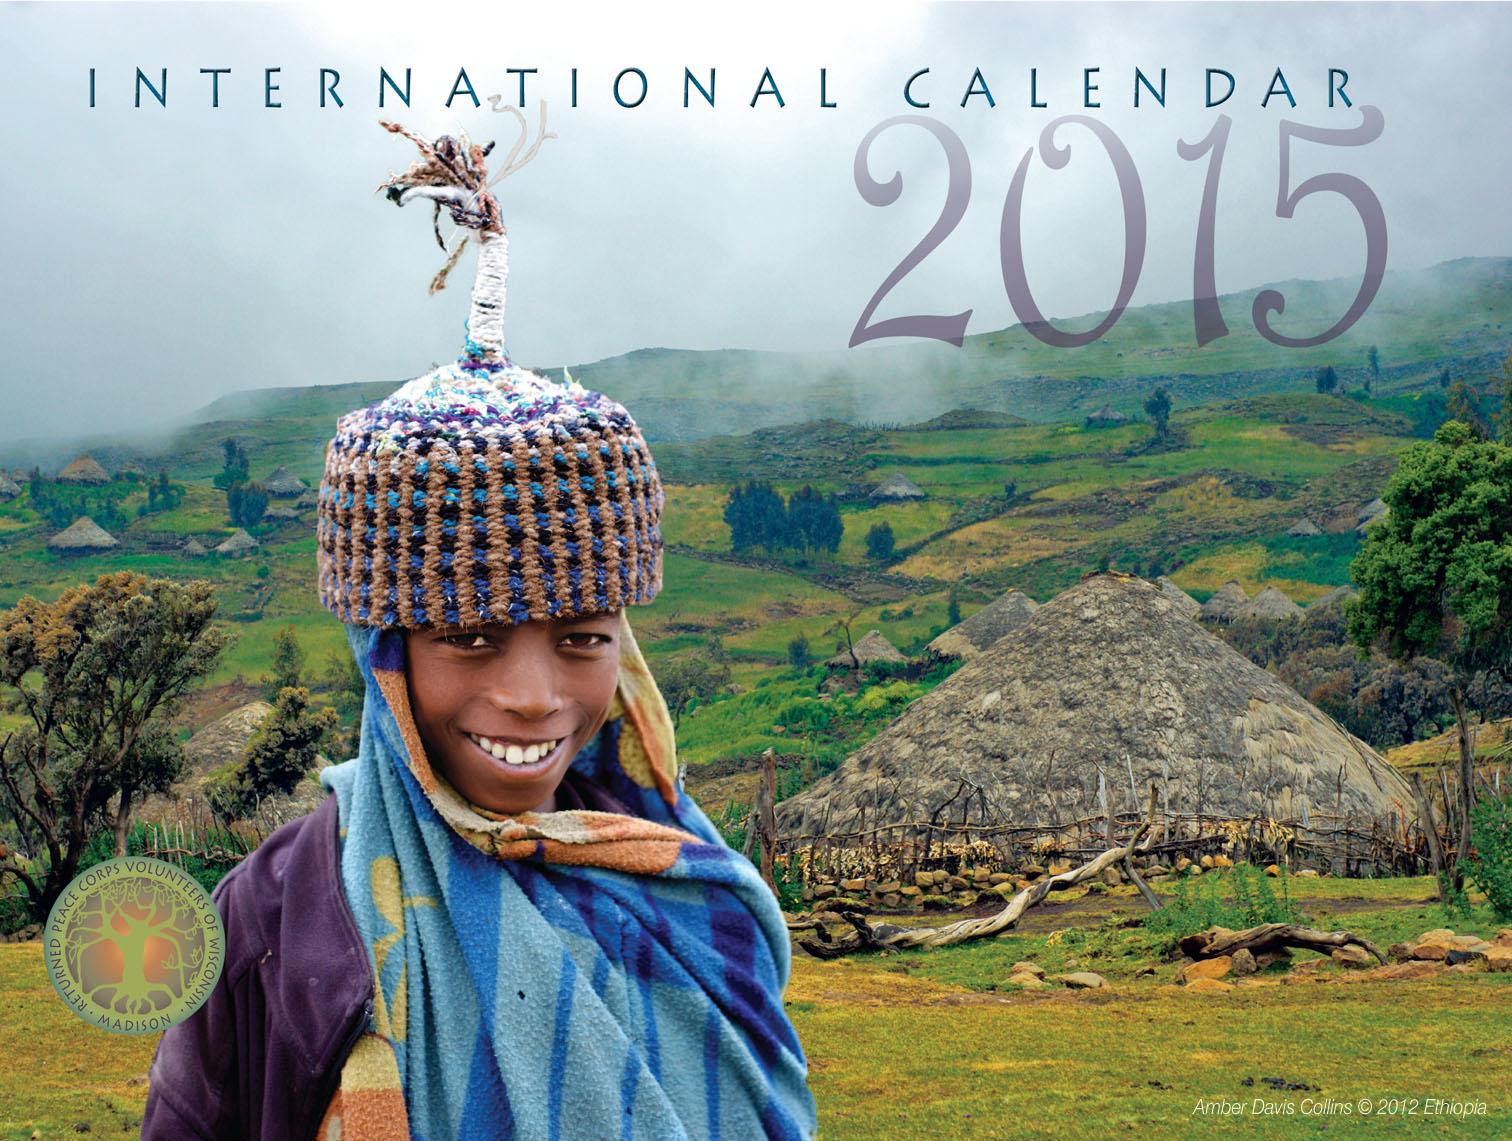 International Calendar 2015 - Ethiopia